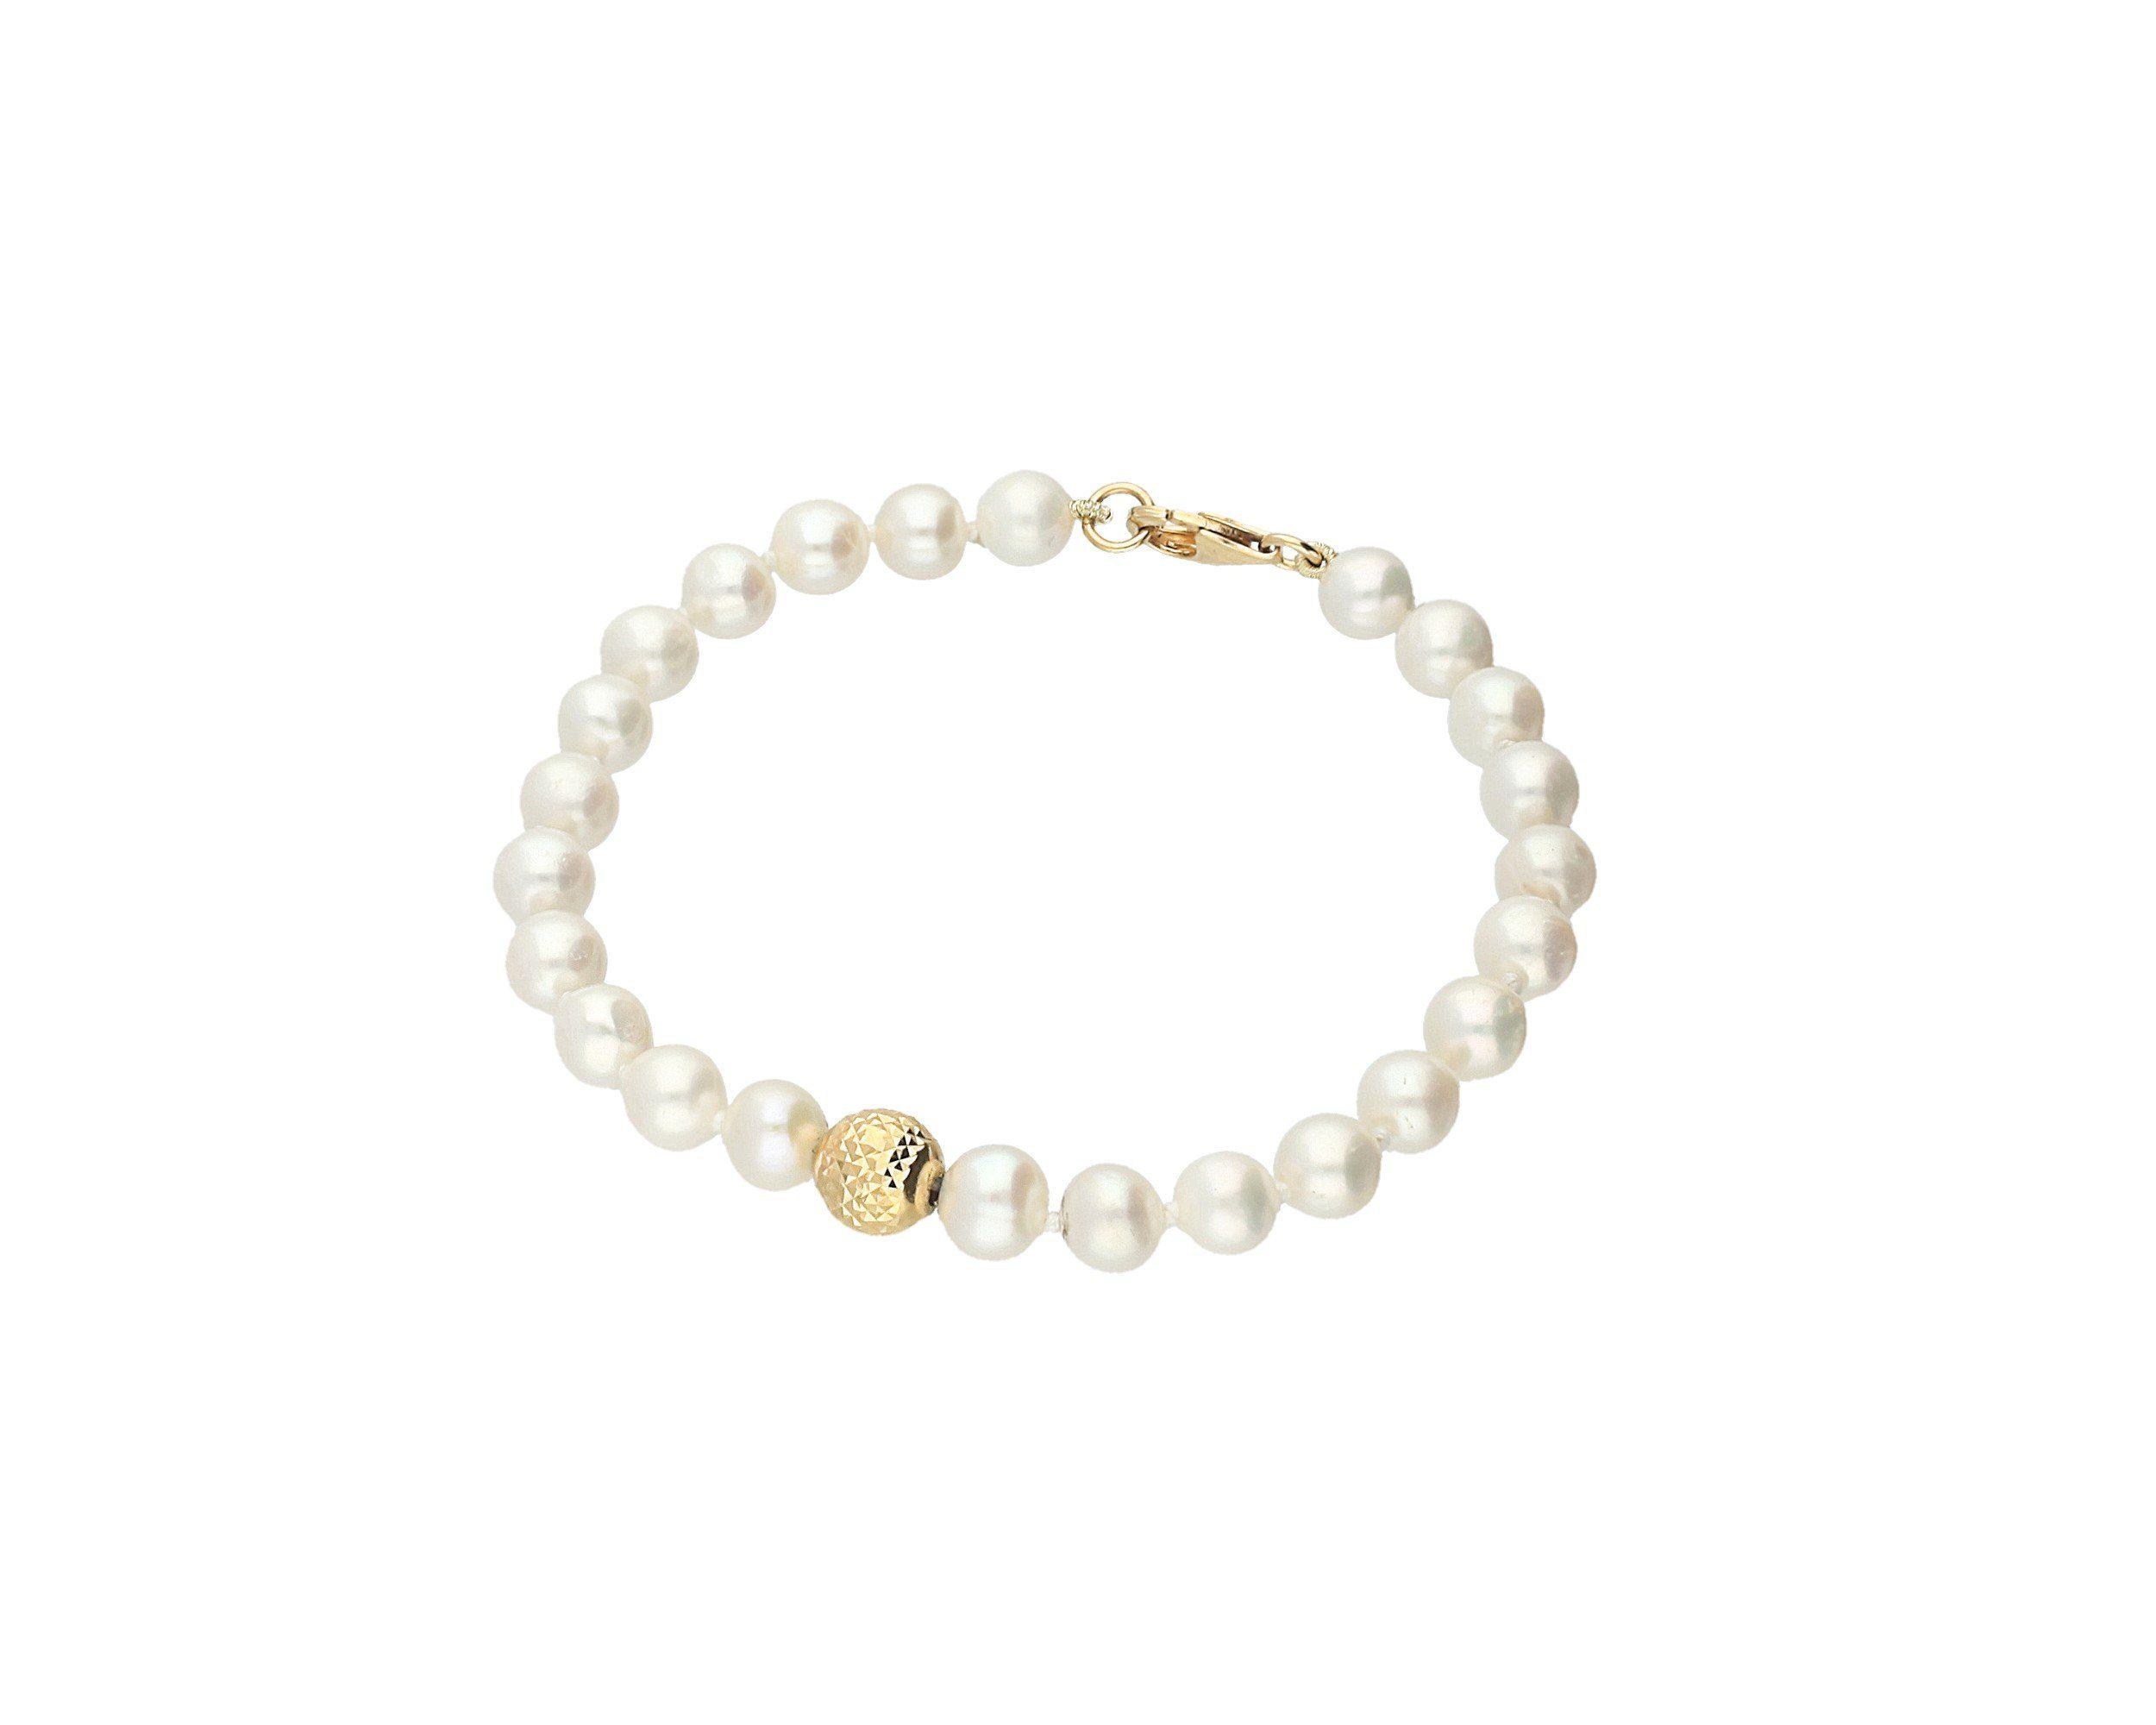 Vivance Perlenarmband White | Schmuck > Armbänder > Perlenarmbänder | Vivance